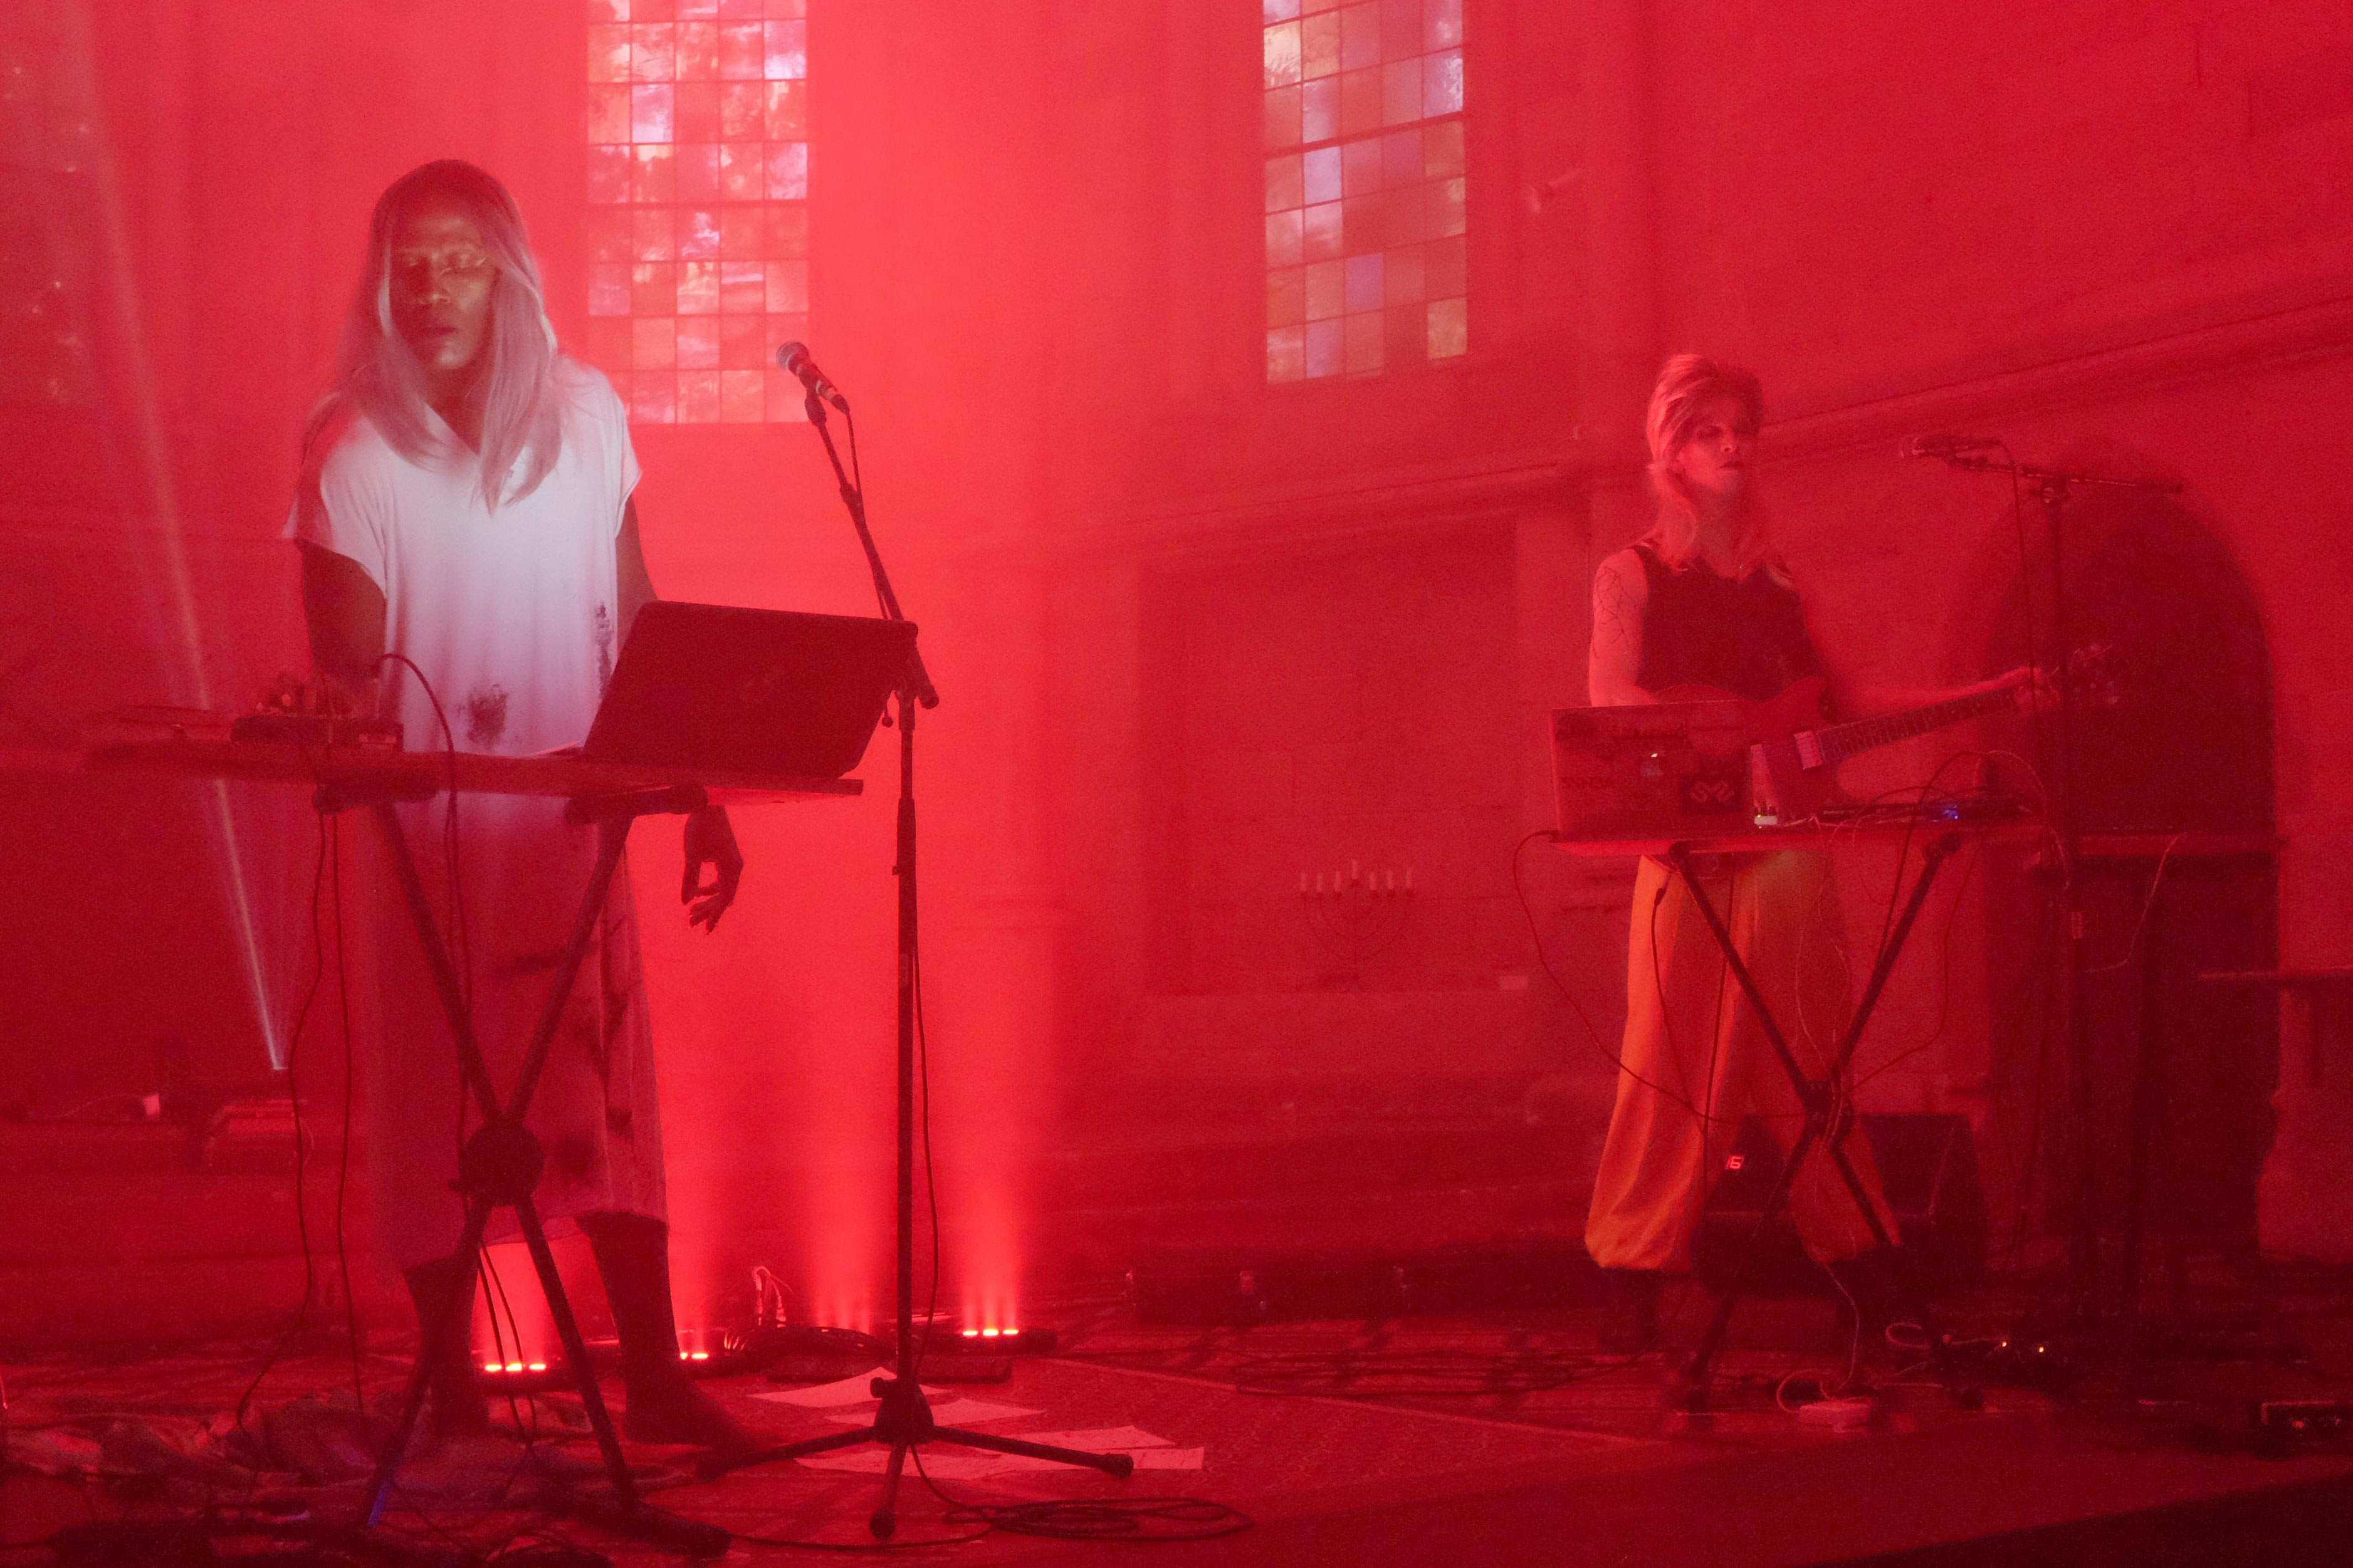 Trance Performance im sakralen Raum